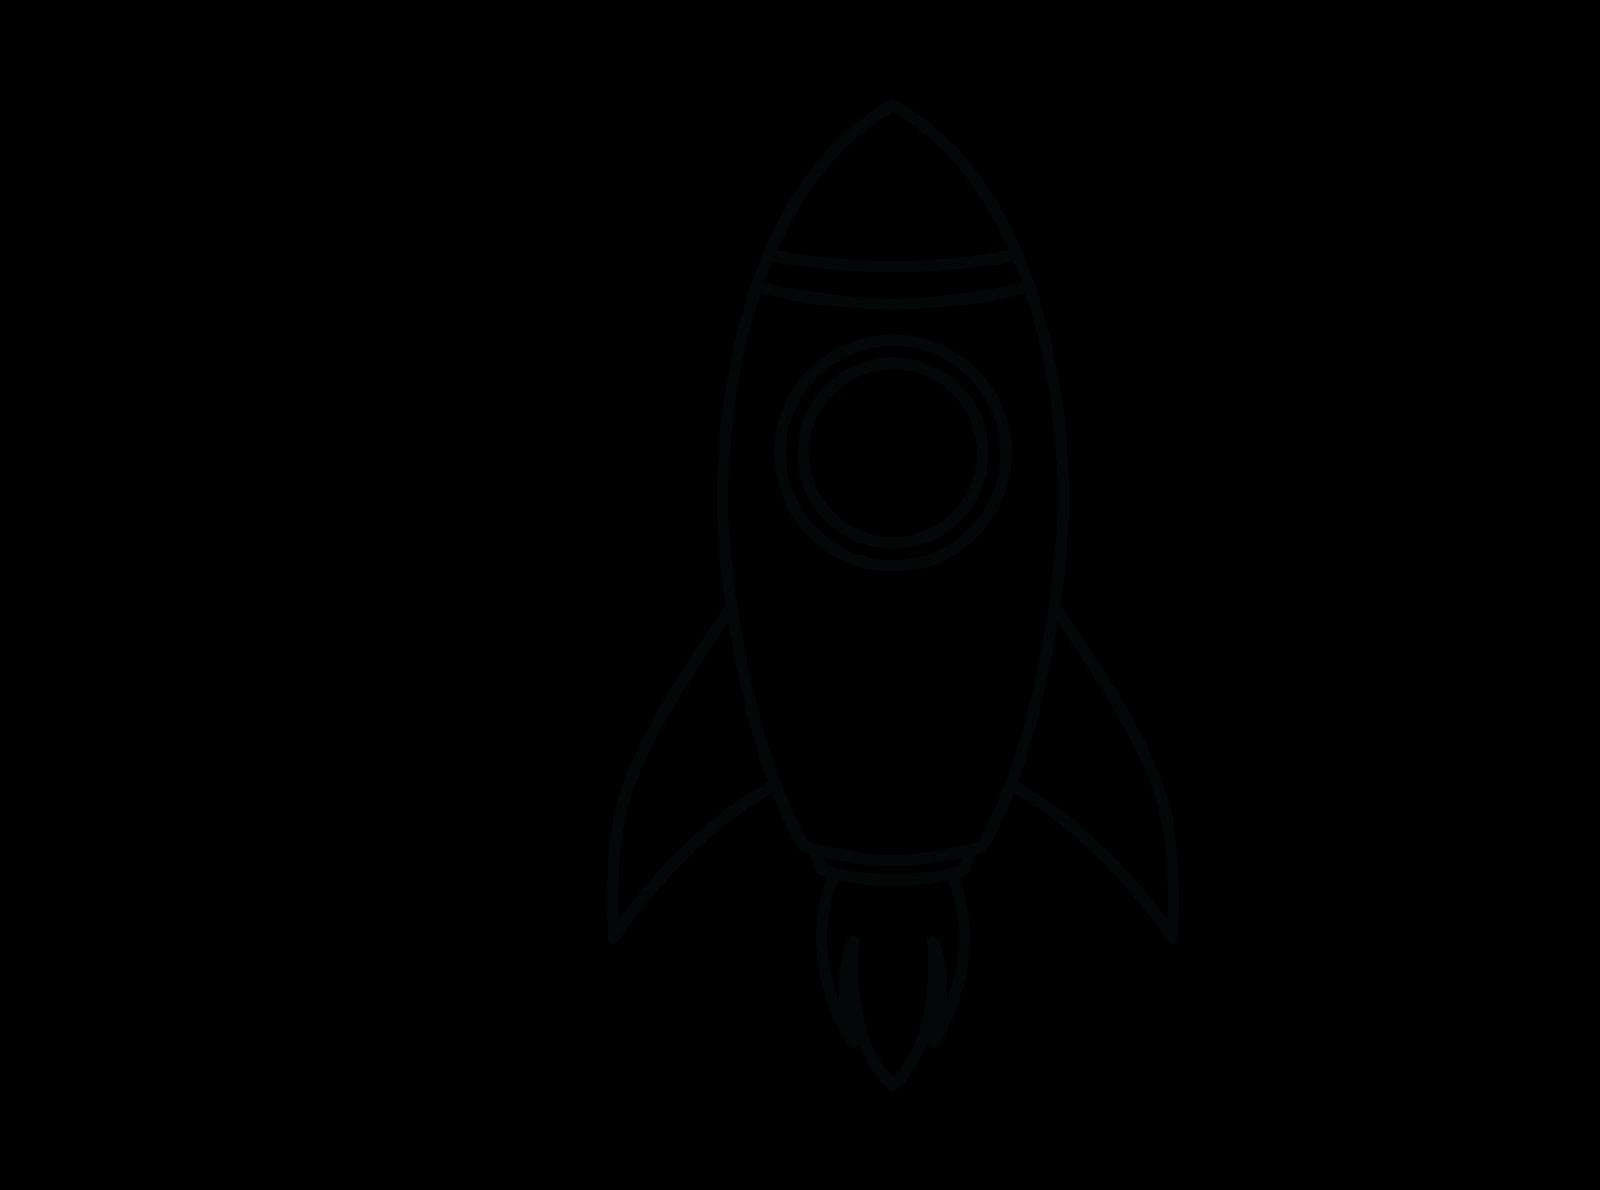 Coloring Rocket For Kids By Kidscorner On Dribbble